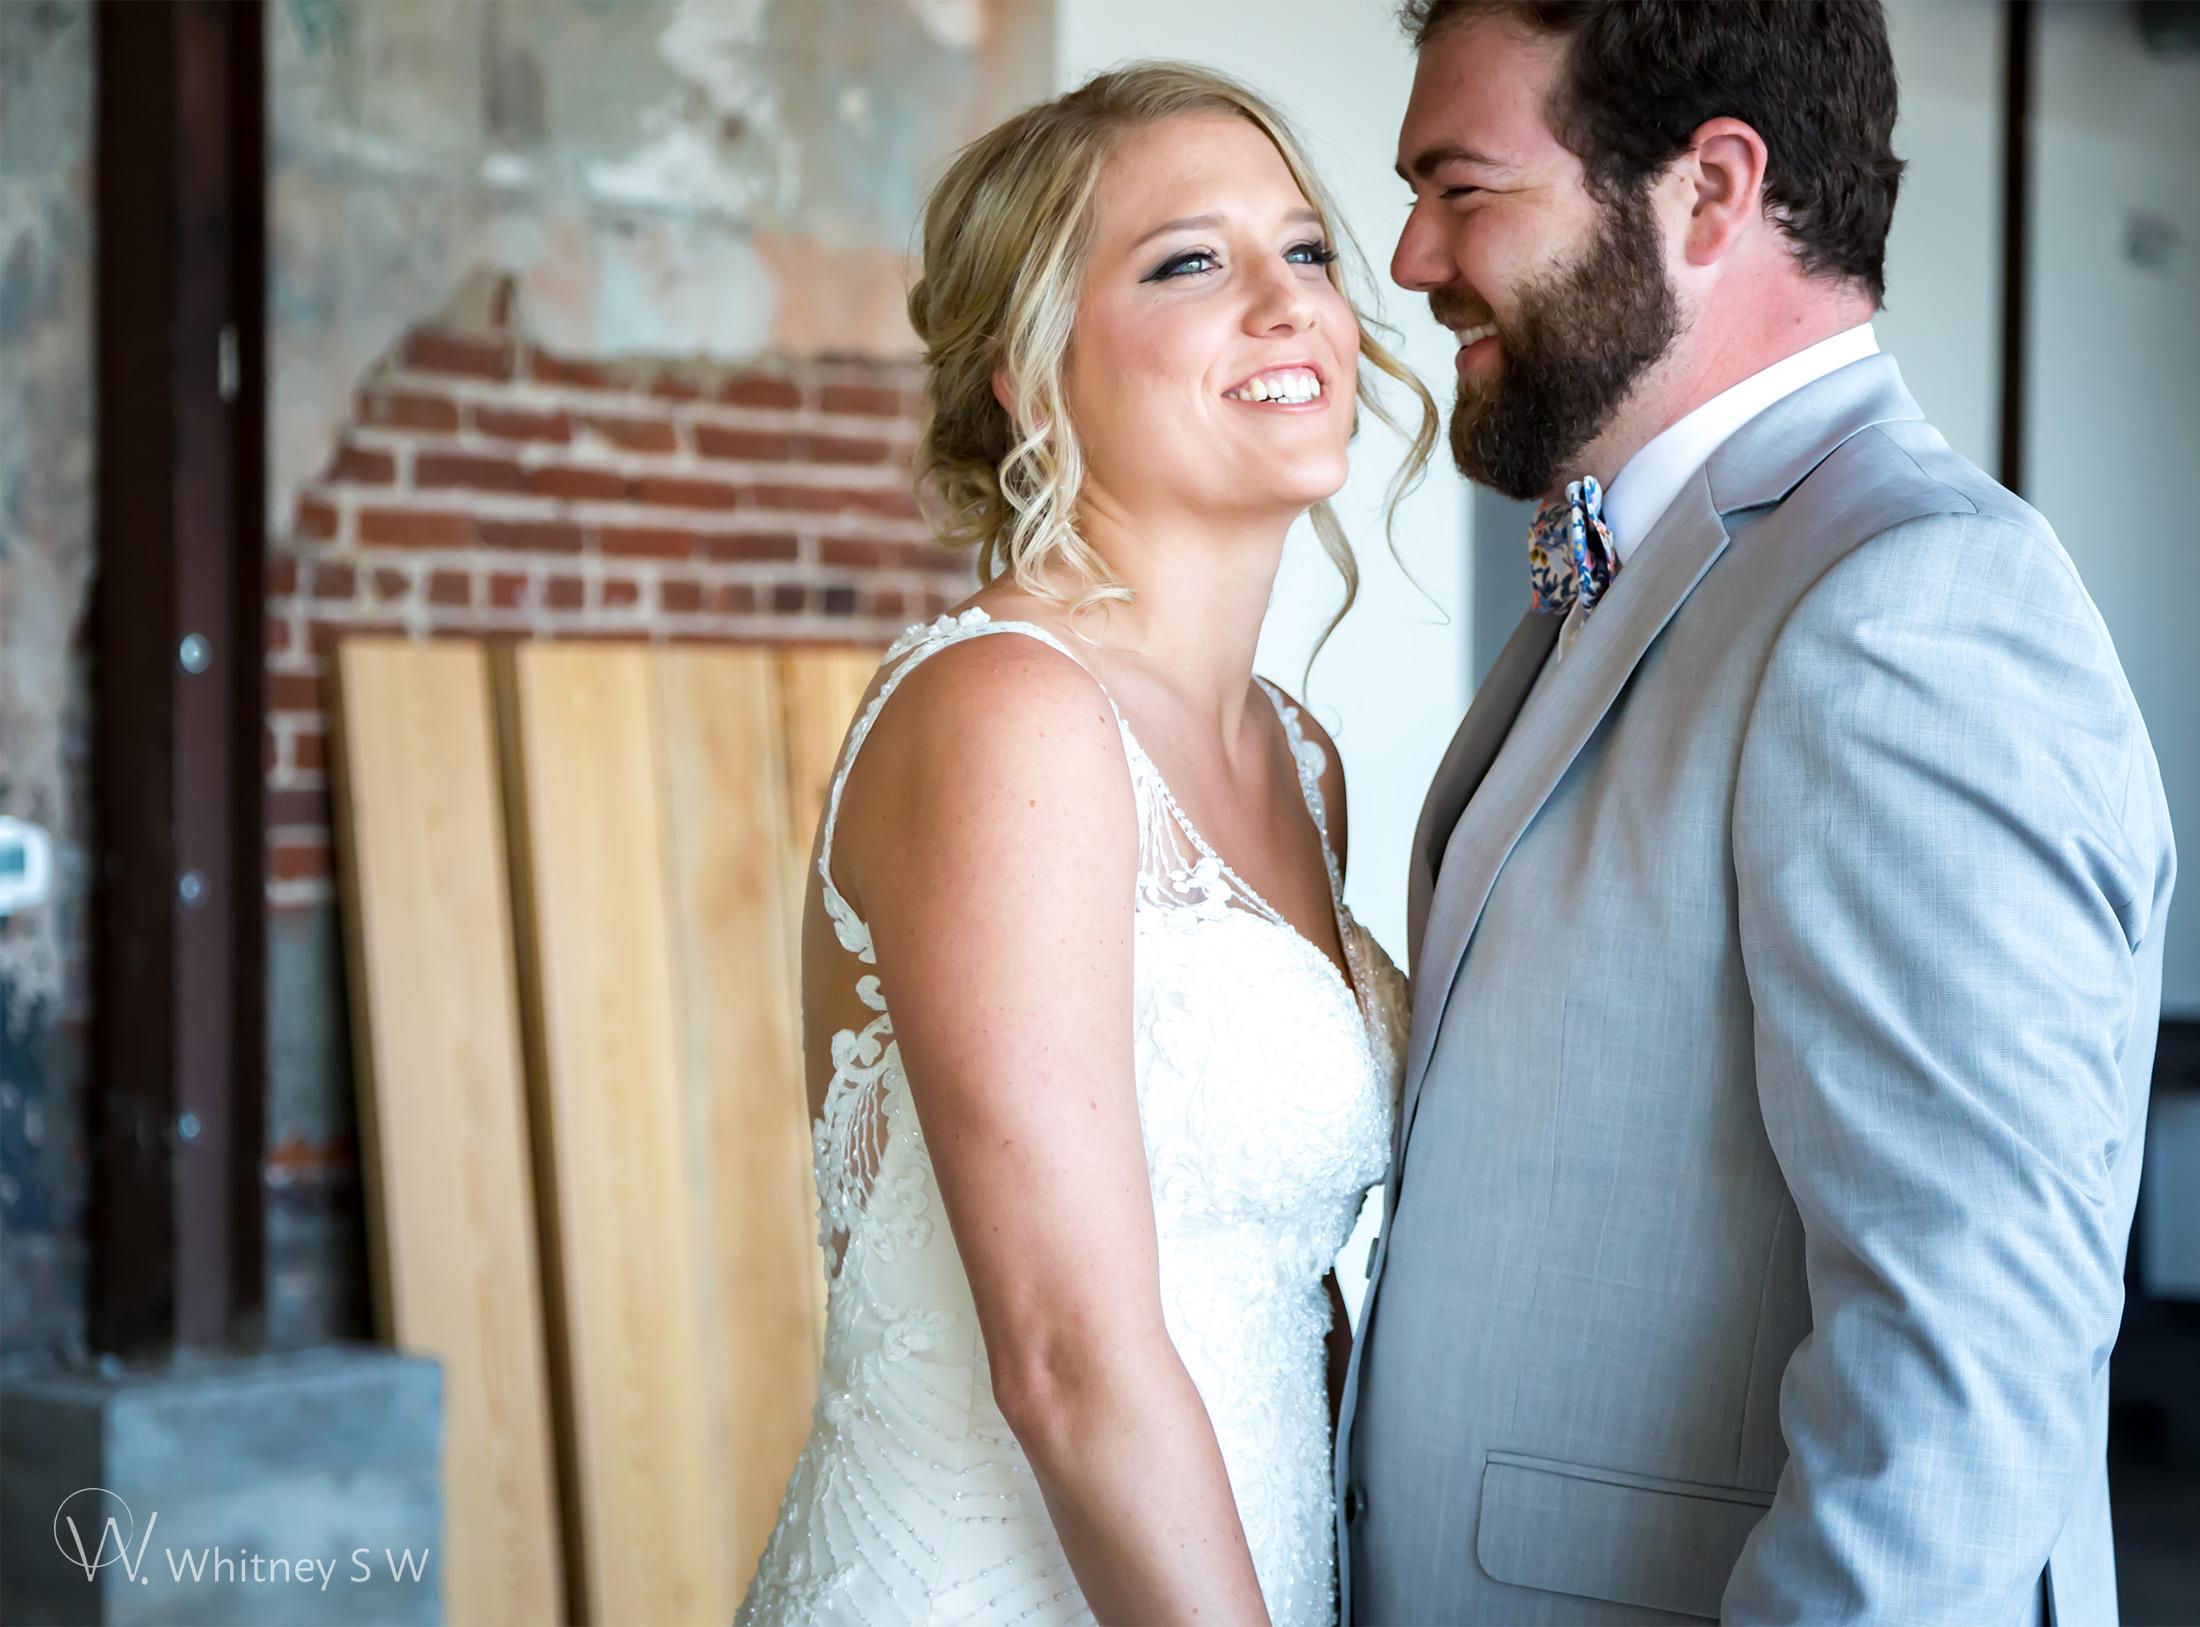 Morgan & Kaivon Wedding - Photography by Whitney S Williams whitneysw (31).jpg